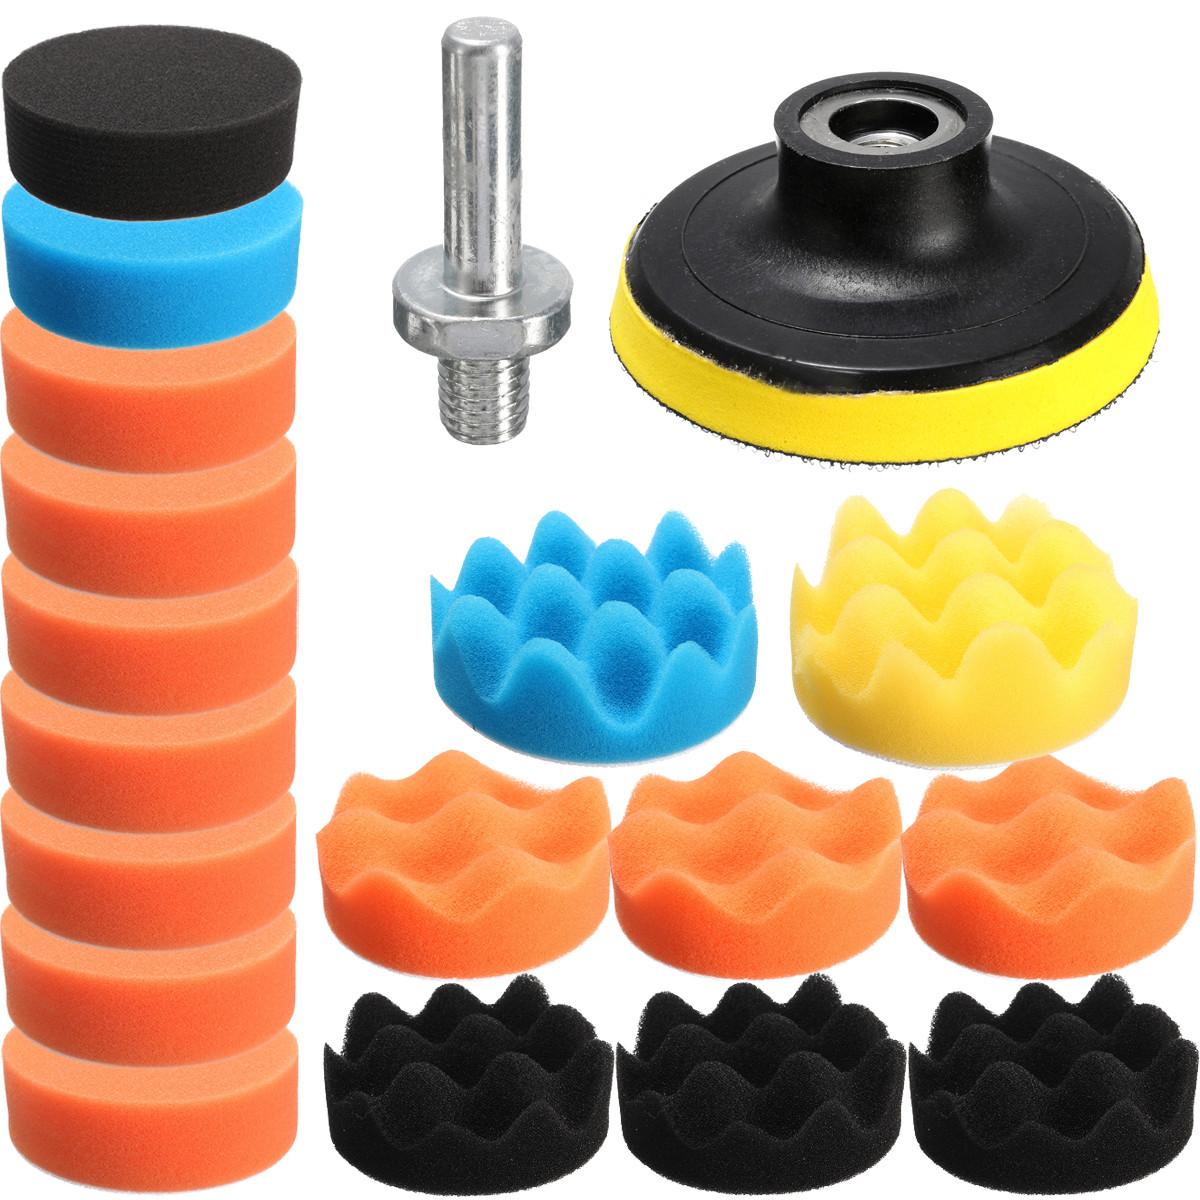 "Drillpro 19pcs 3"" Inch Sponge Polishing Buff Buffing Pad Kit Set For Car Polisher+Drill Adapter-M10"